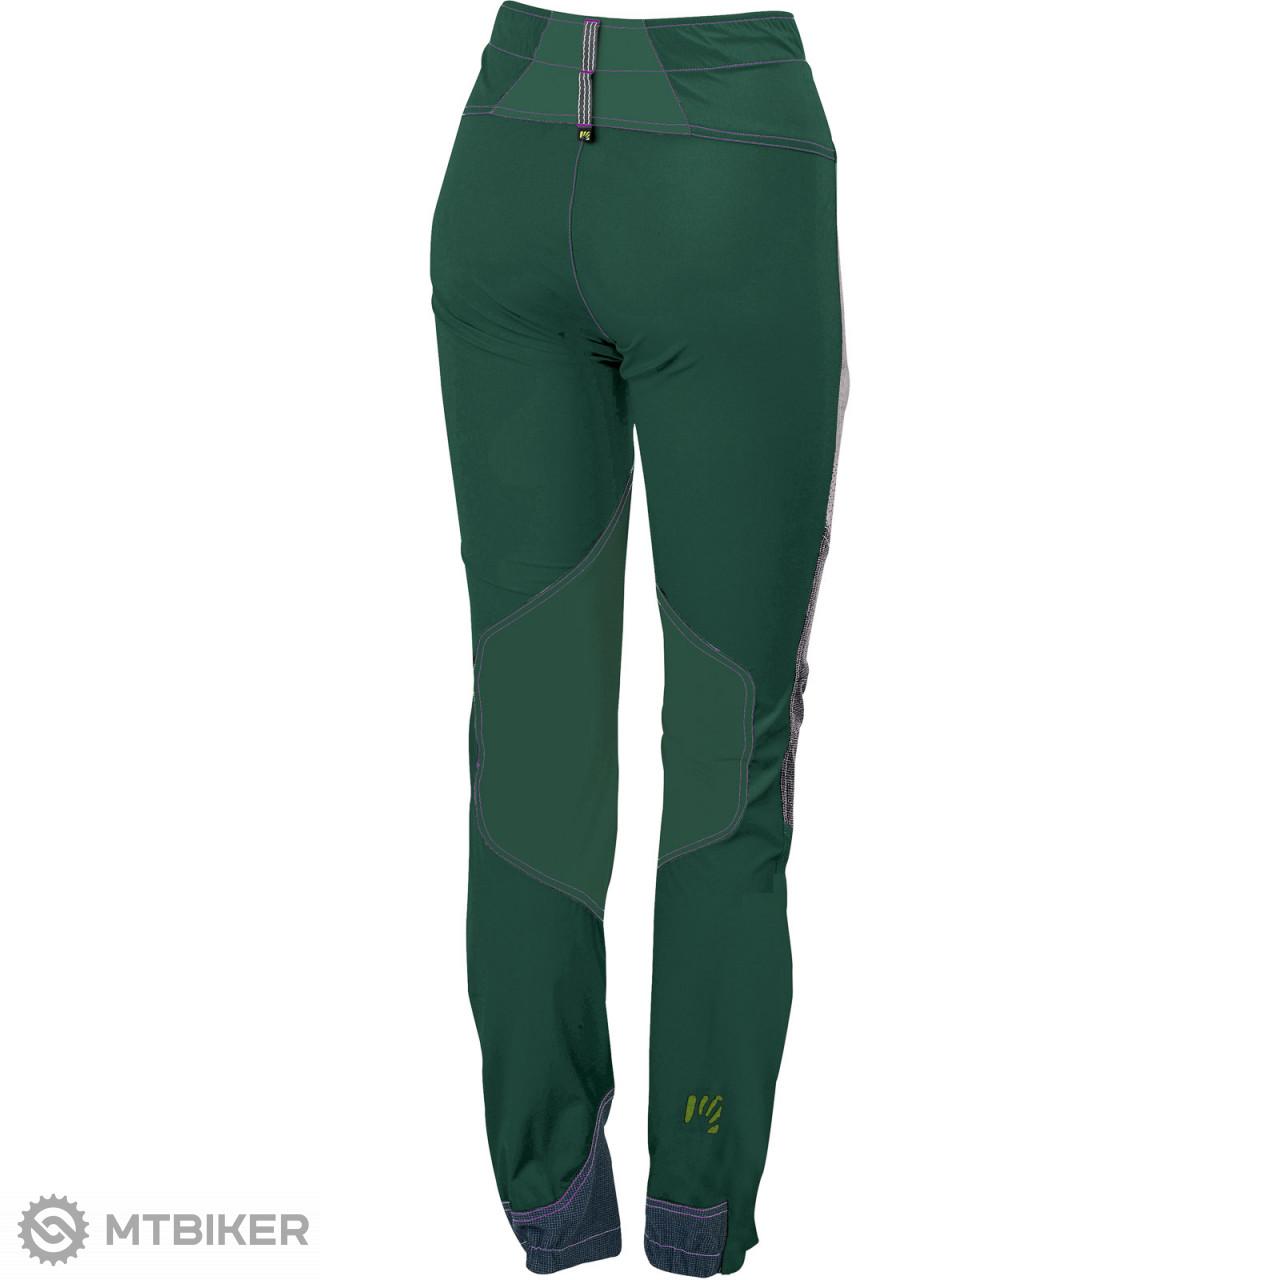 d3750e23530e Karpos ROCK dámske nohavice tmavozelené - MTBIKER Shop